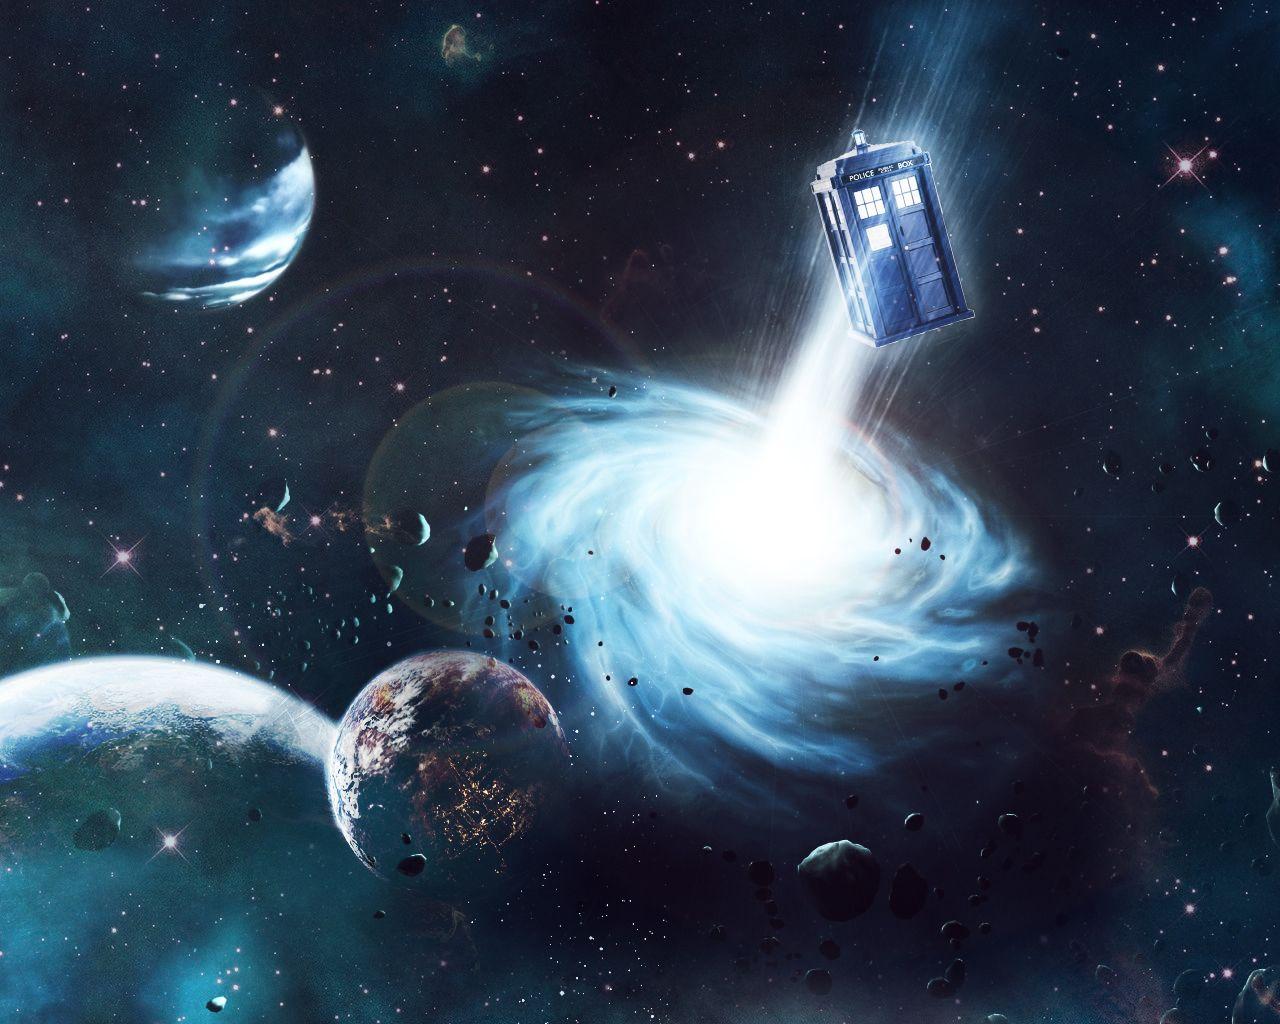 TARDIS In Space Wallpaper By Carnagebgdeviantart On DeviantArt